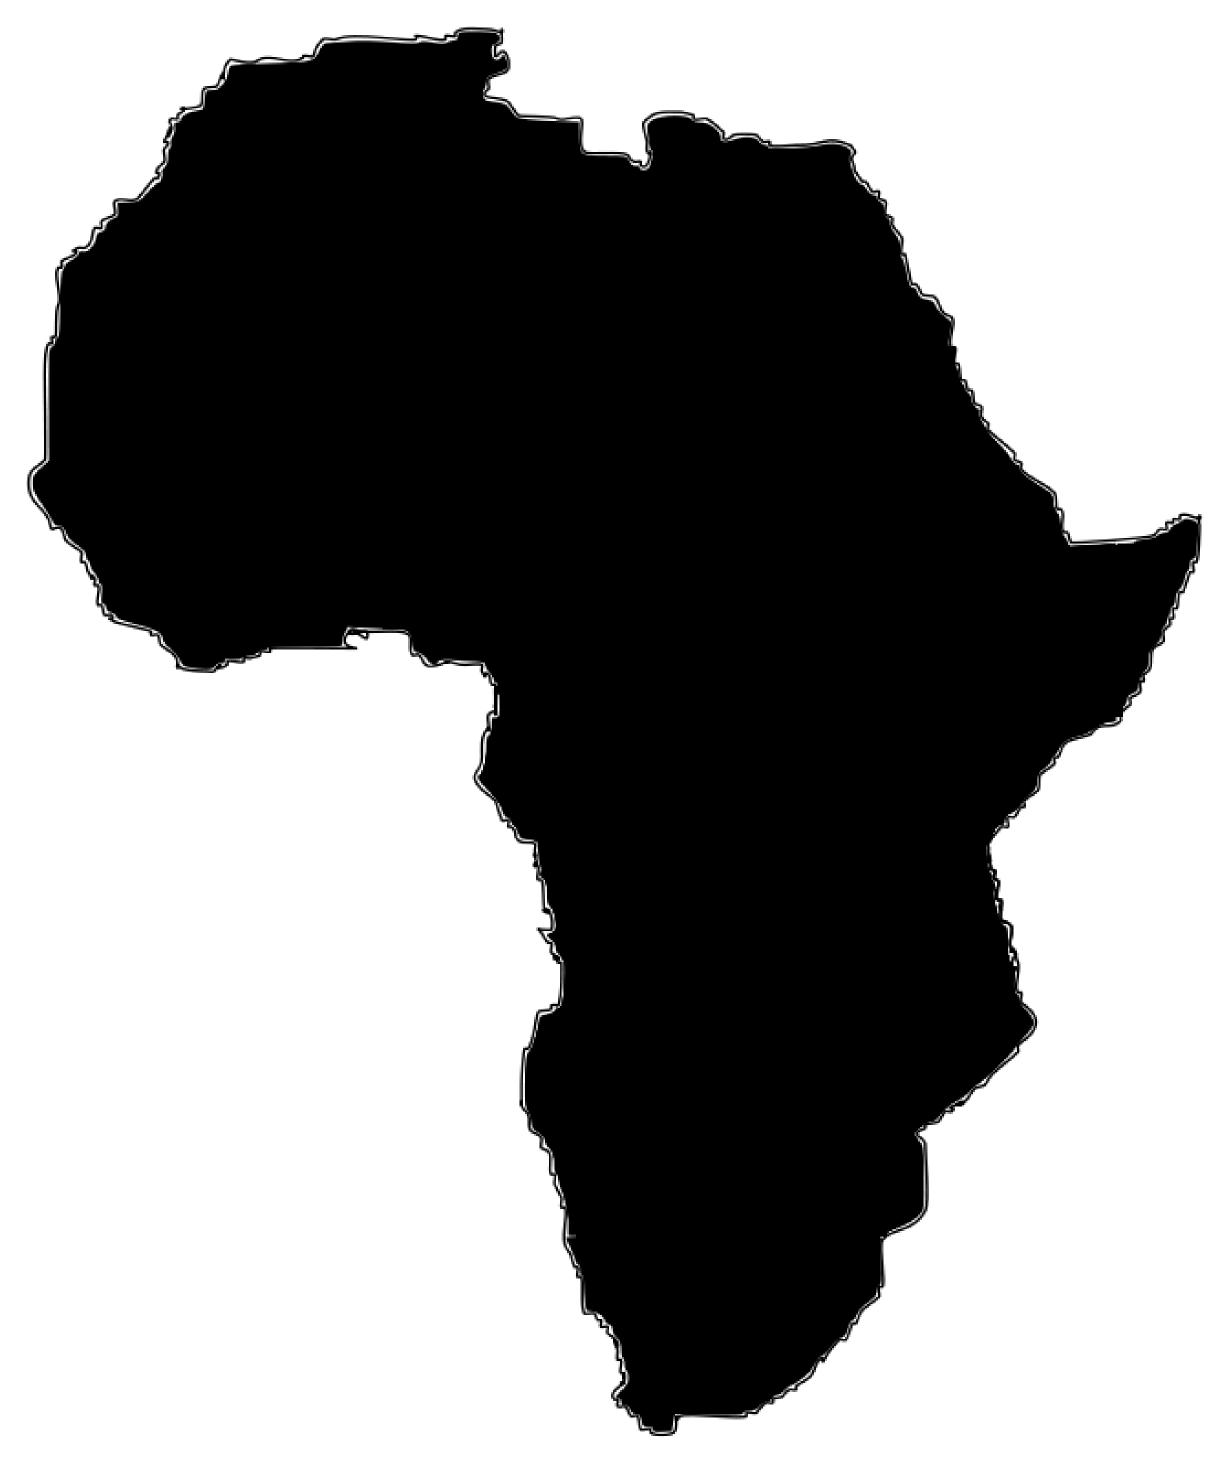 Africa Clipart.